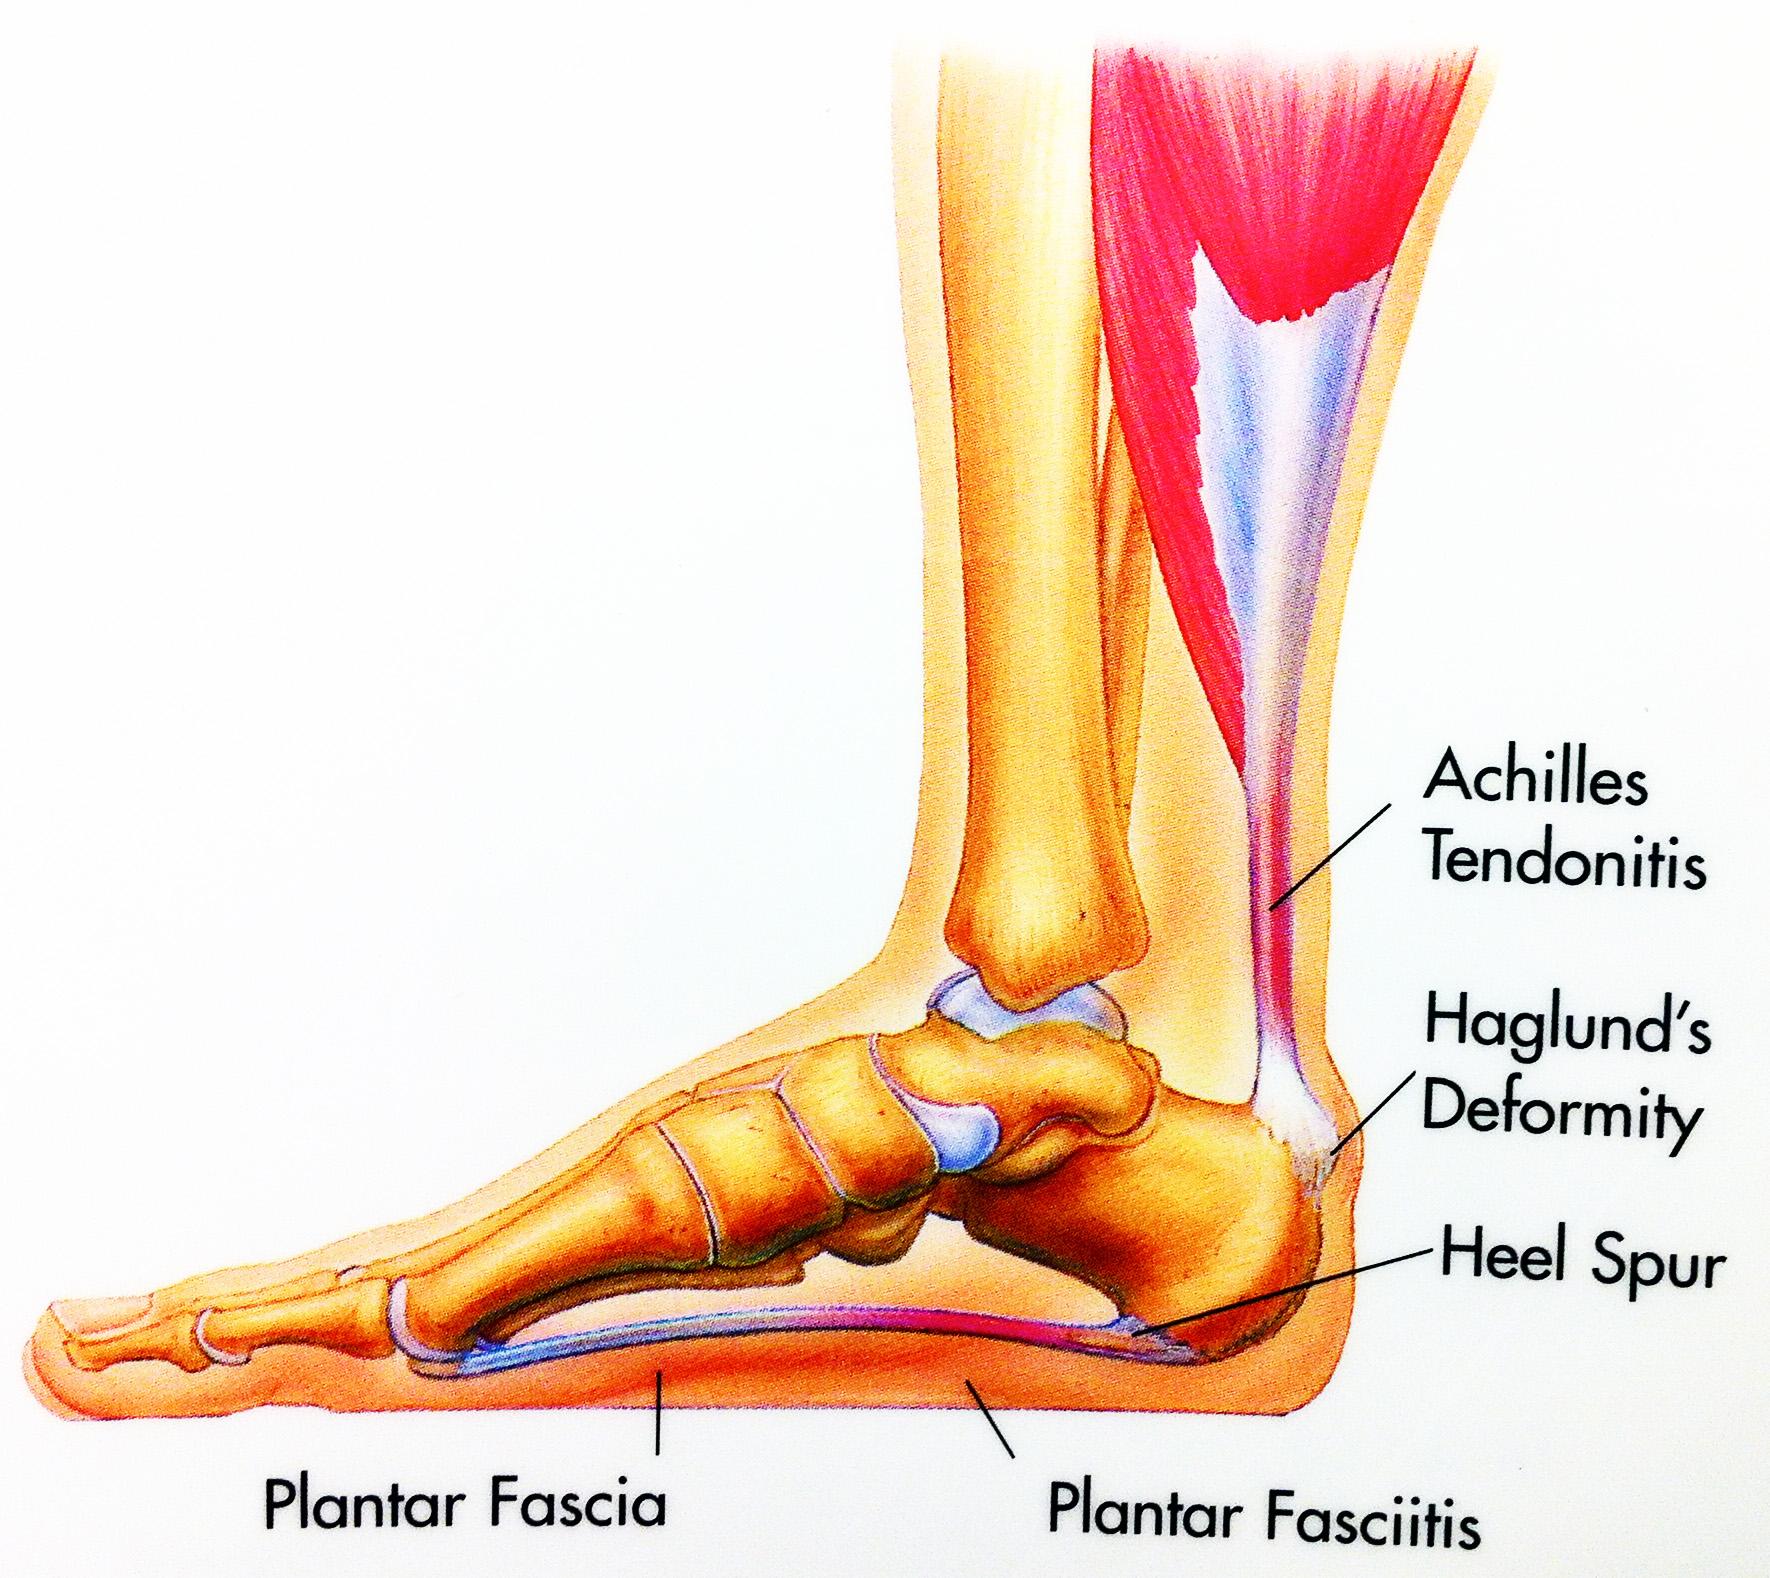 Calcaneal Spur Symptoms And Treatment